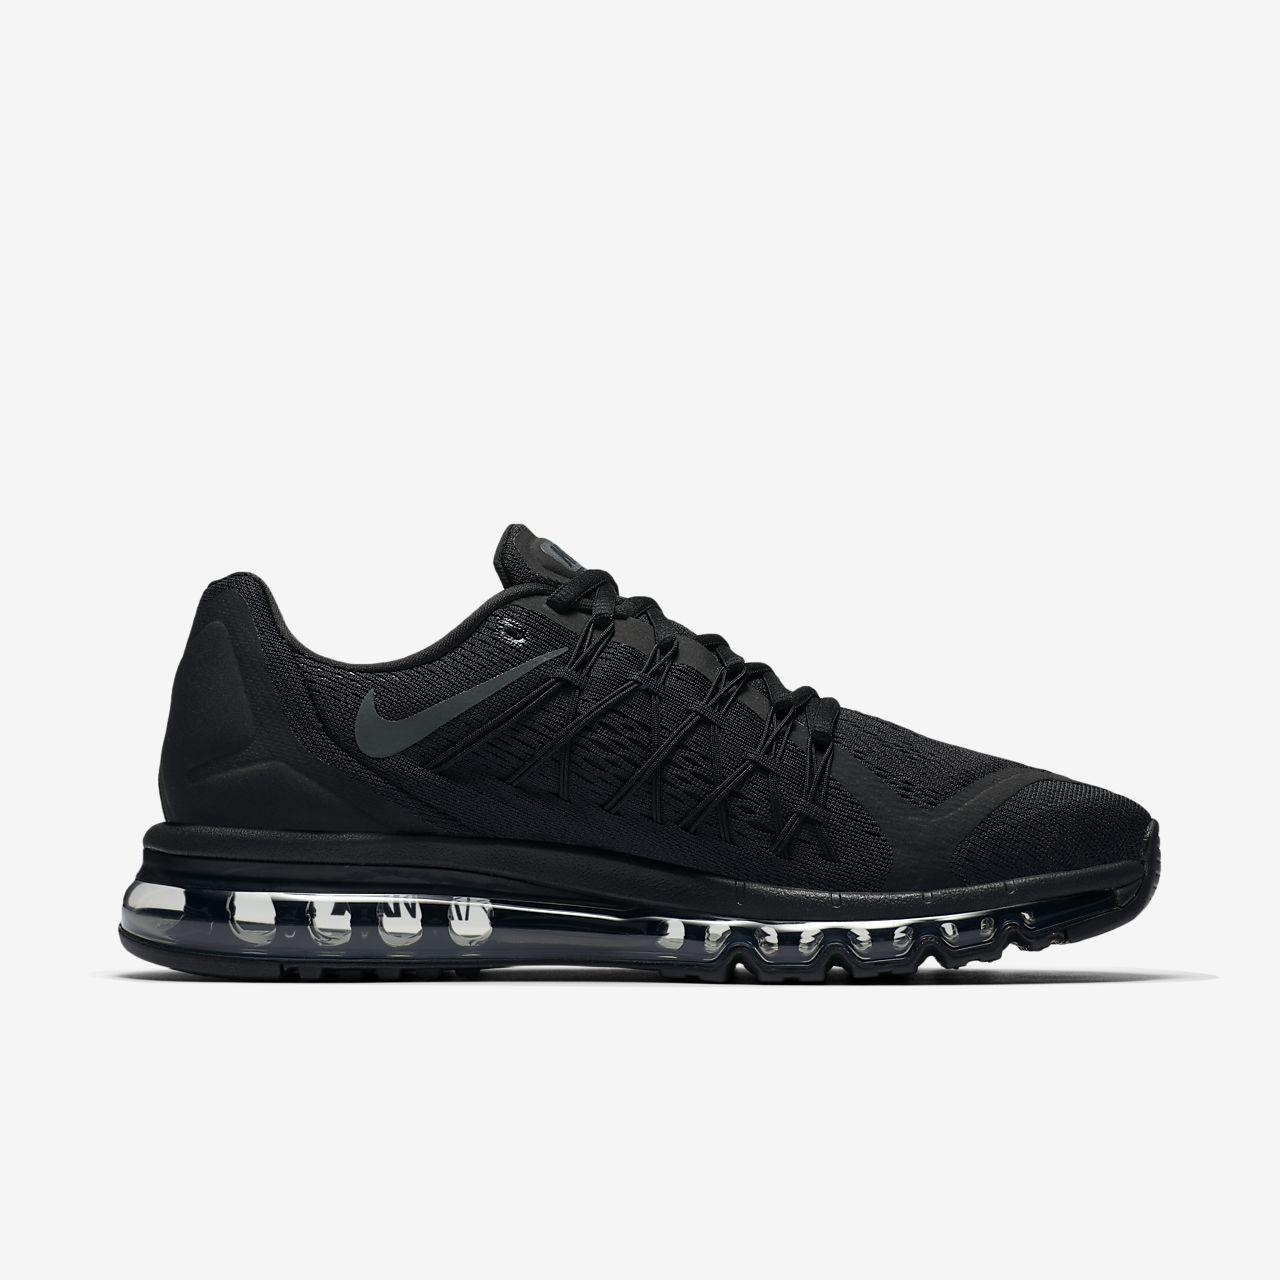 meilleur pas cher 5fa91 ad9c9 Chaussure Nike Air Max 2015 pour Homme